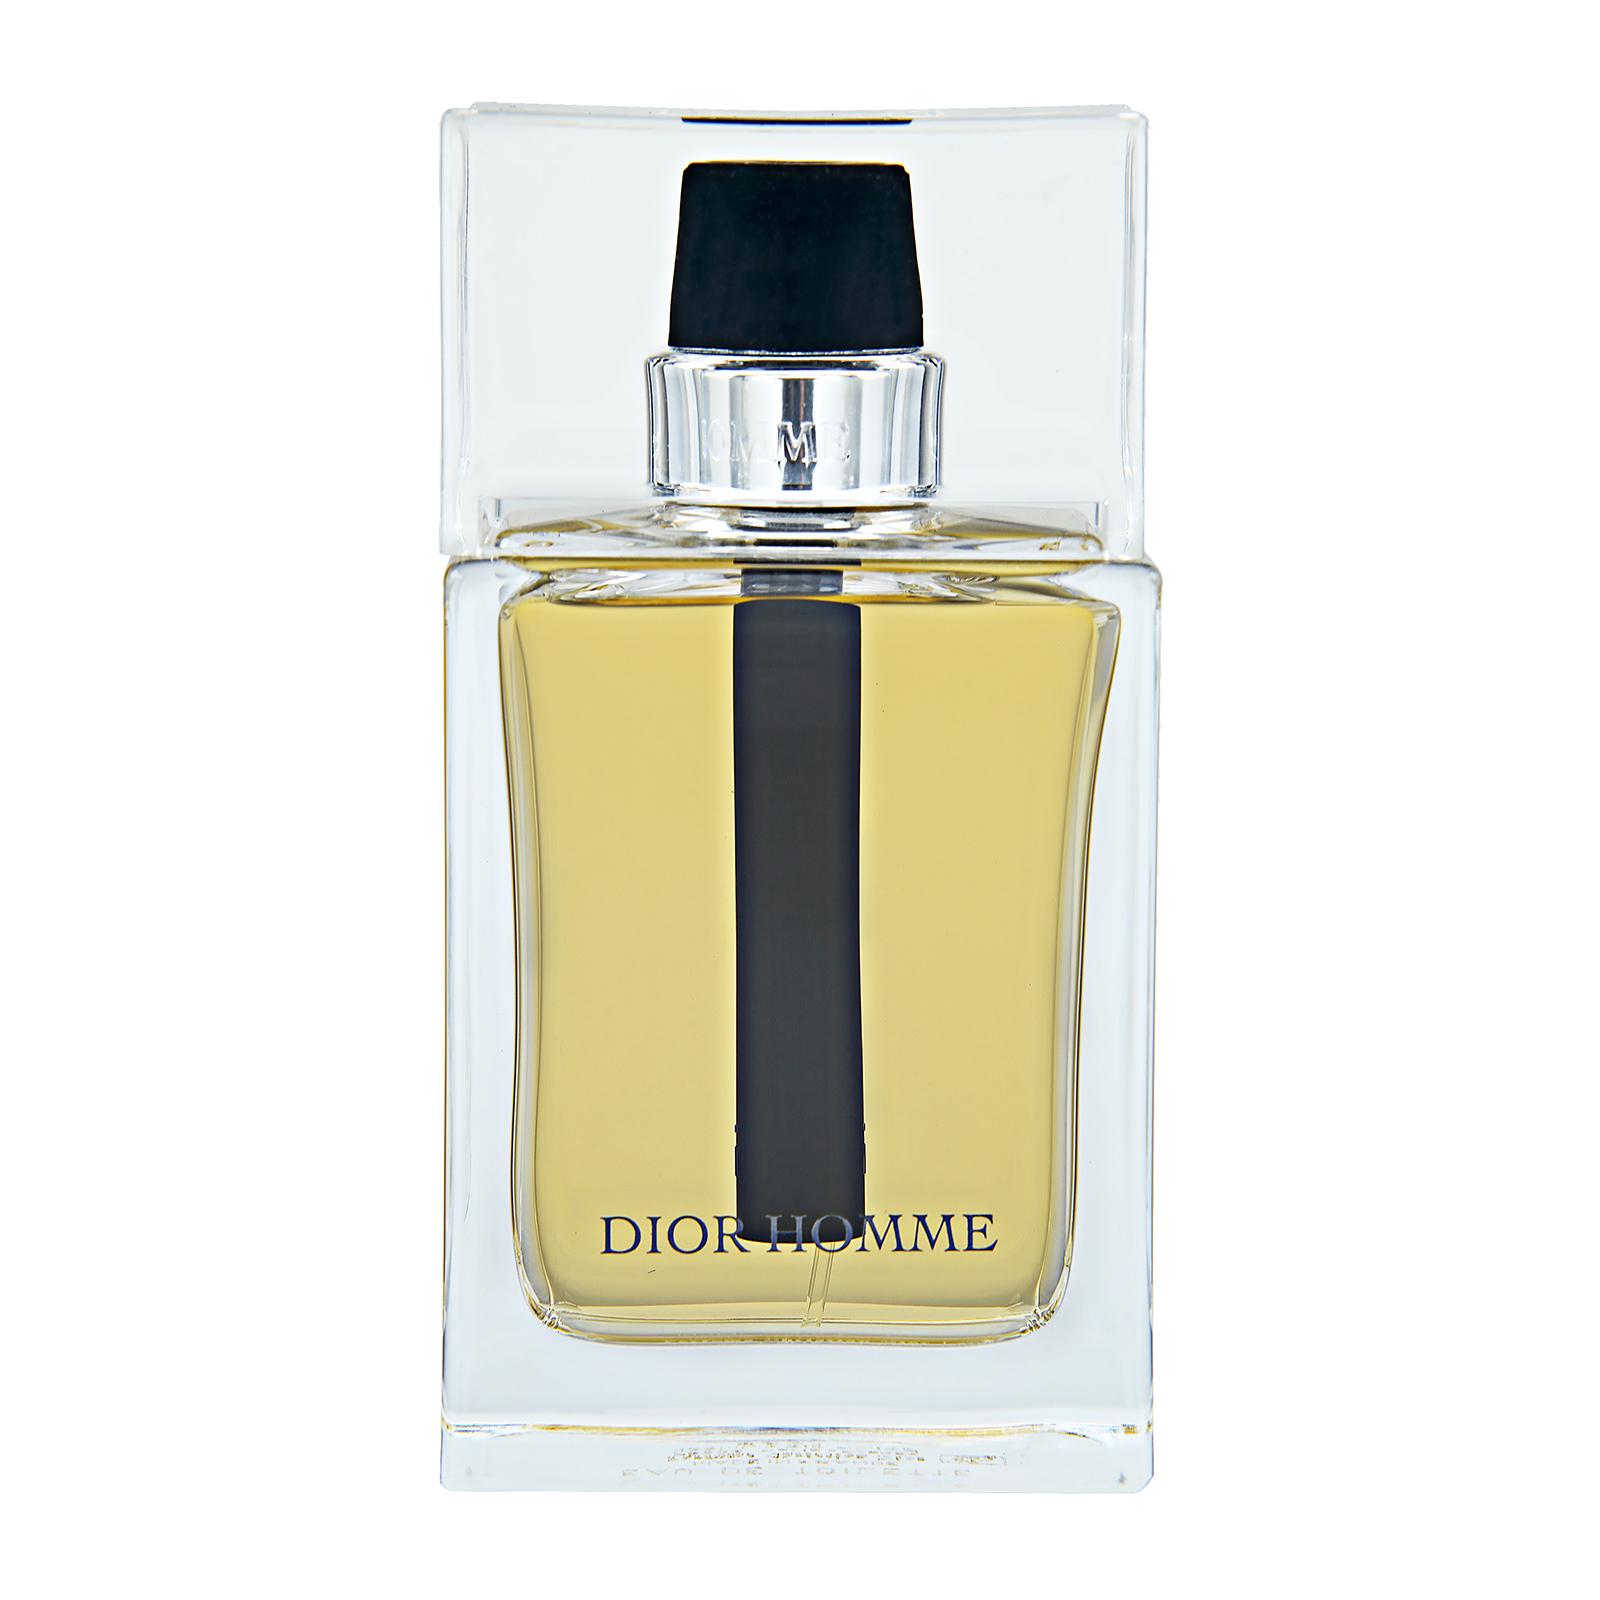 Christian Dior Dior Homme EDT 3.4oz, 100ml